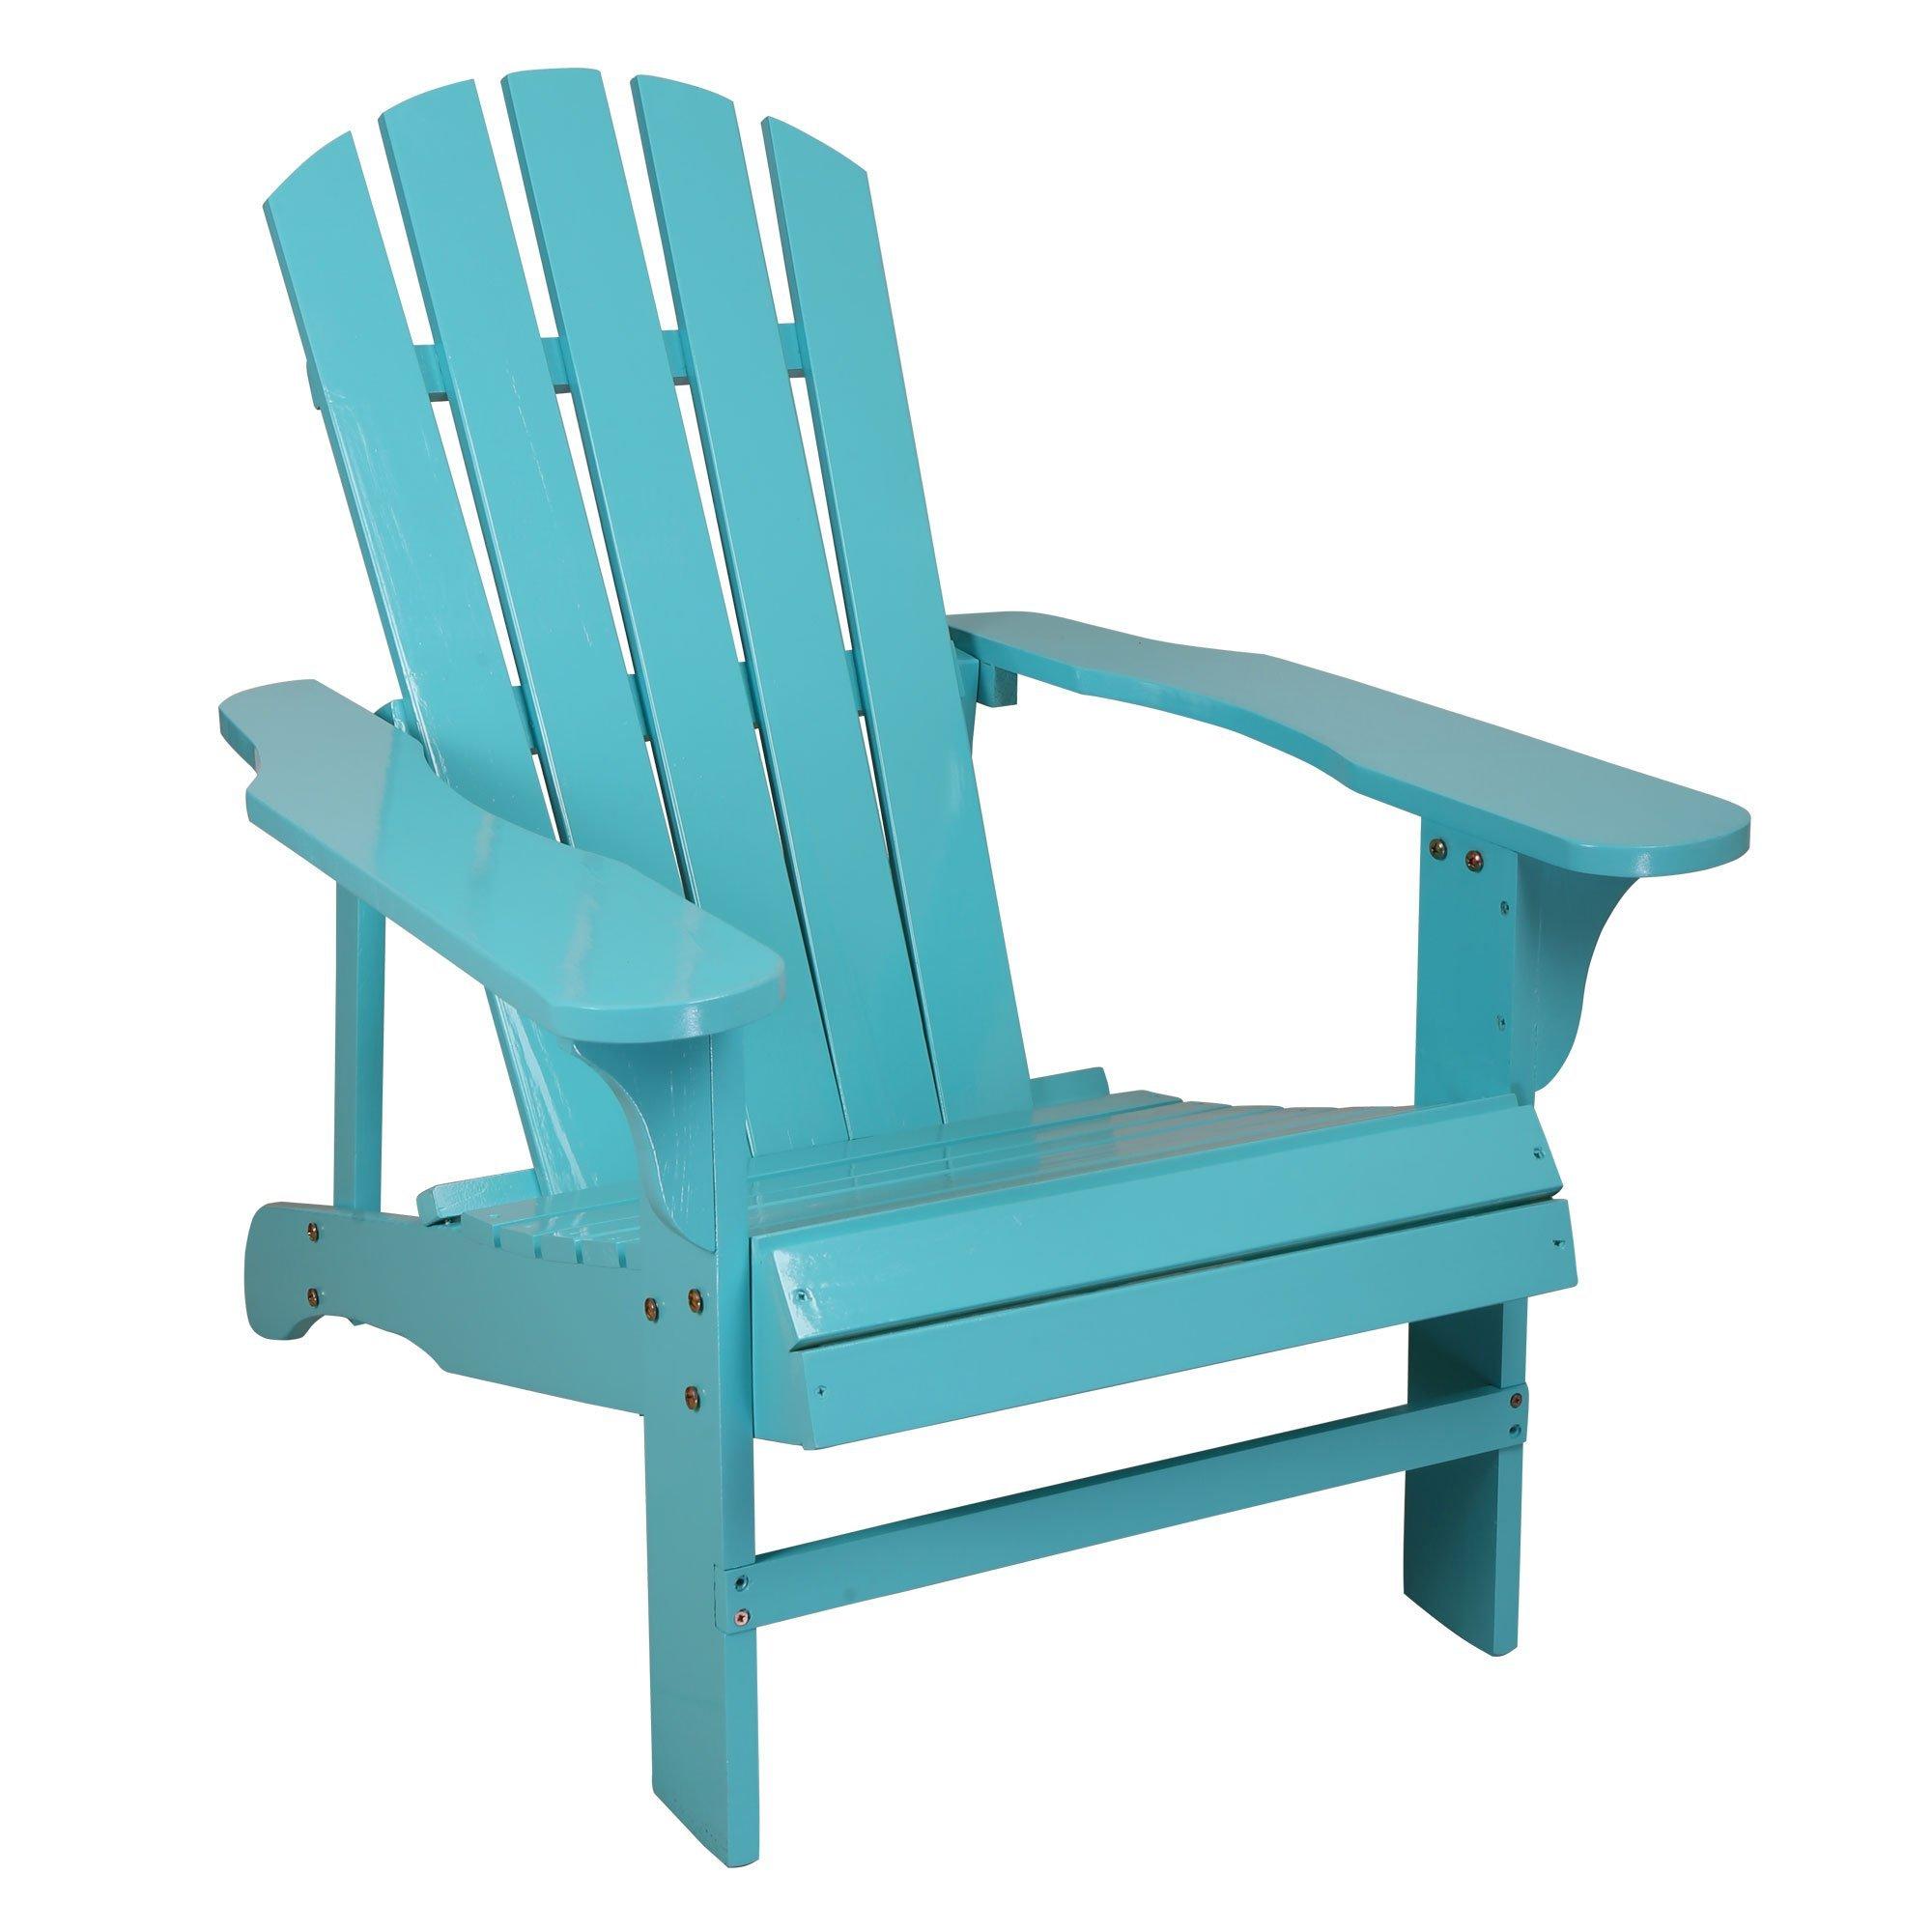 Songsen Outdoor Wooden Adirondack Chair Lawn Patio Deck Garden Furniture, Light Blue